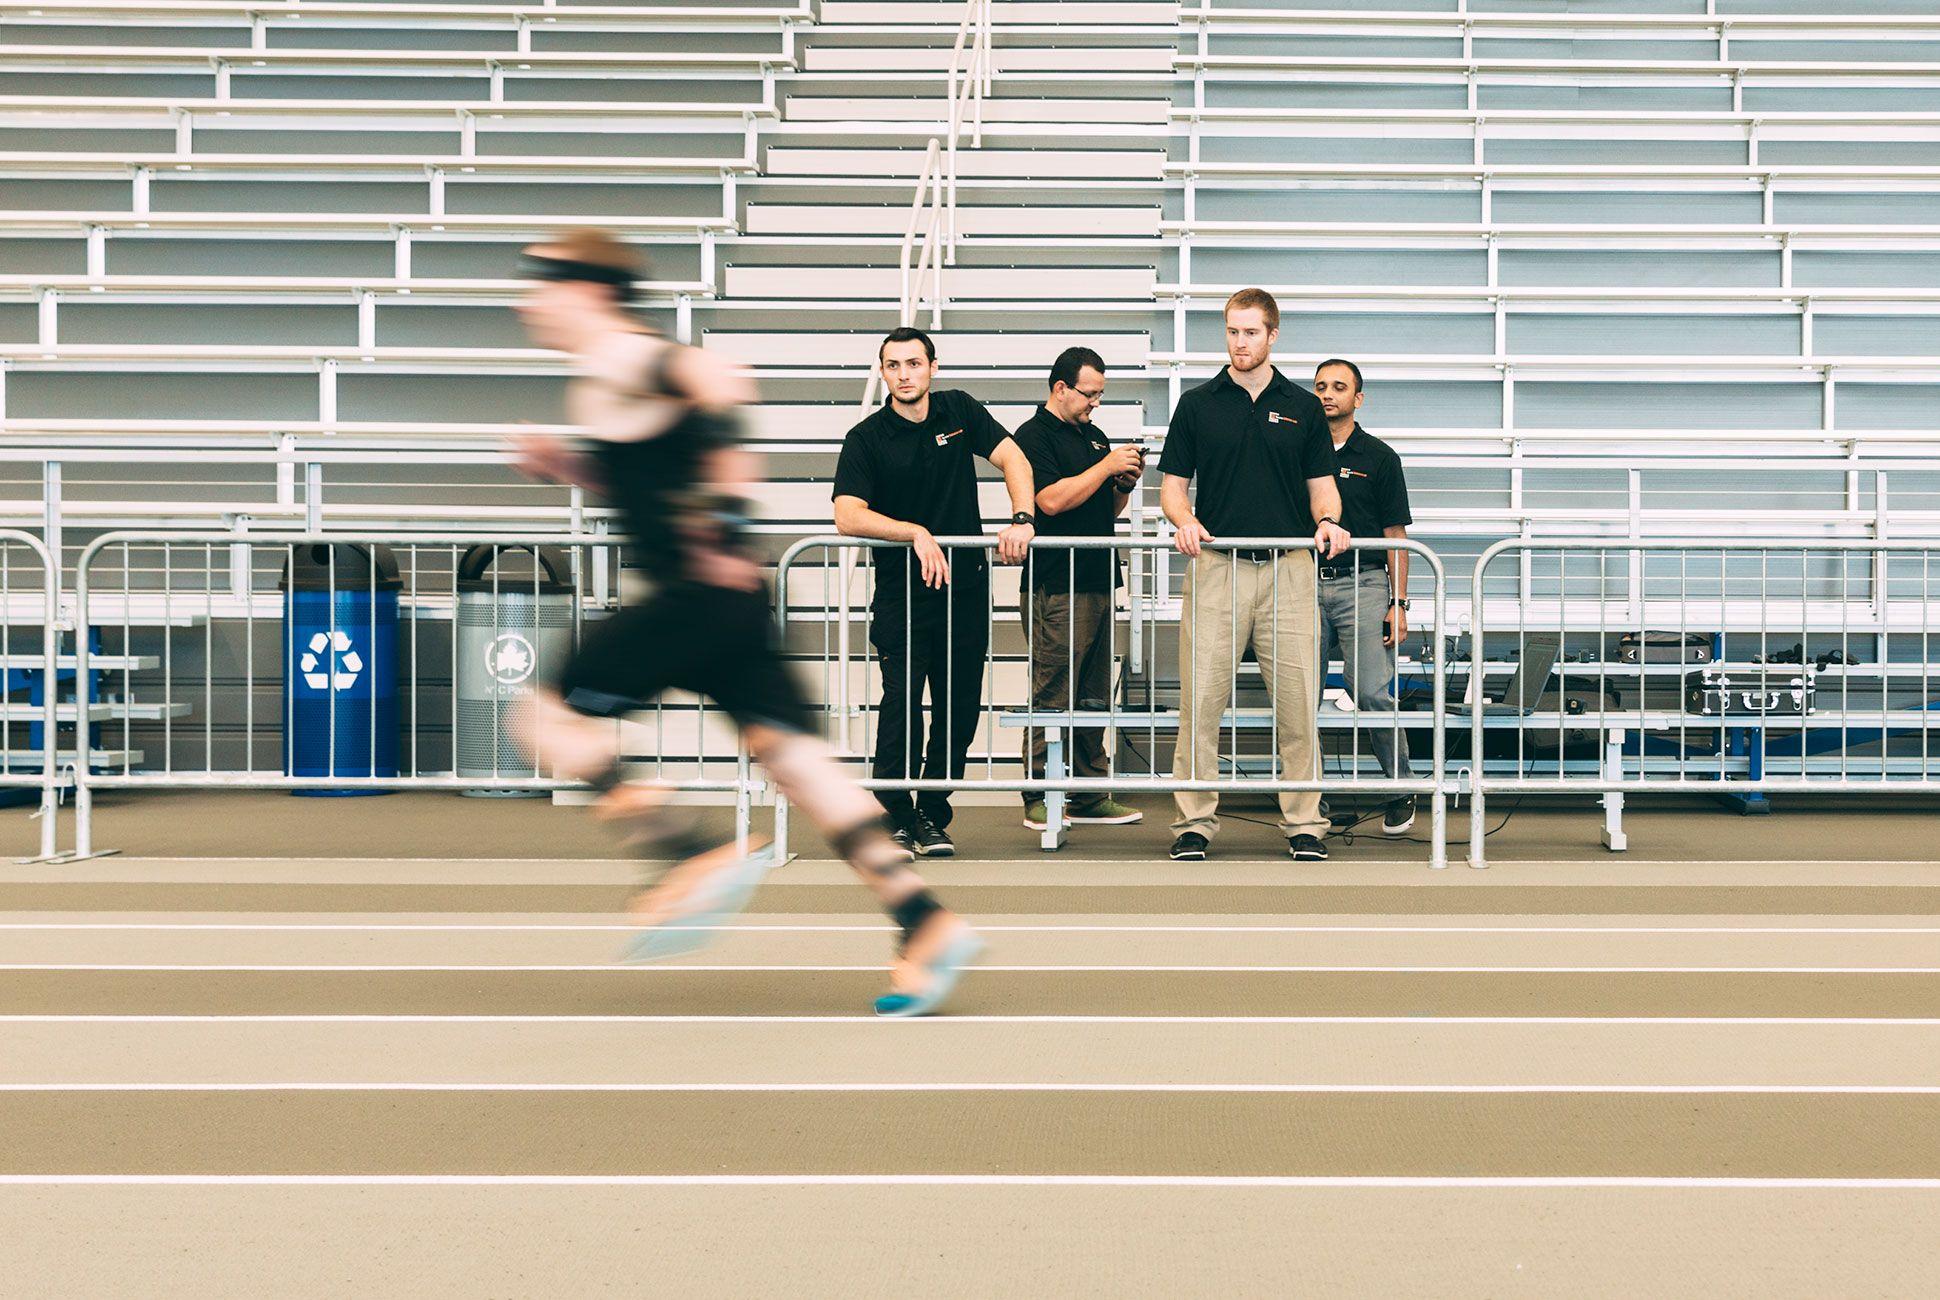 athlete-testing-gear-patrol-slide-2